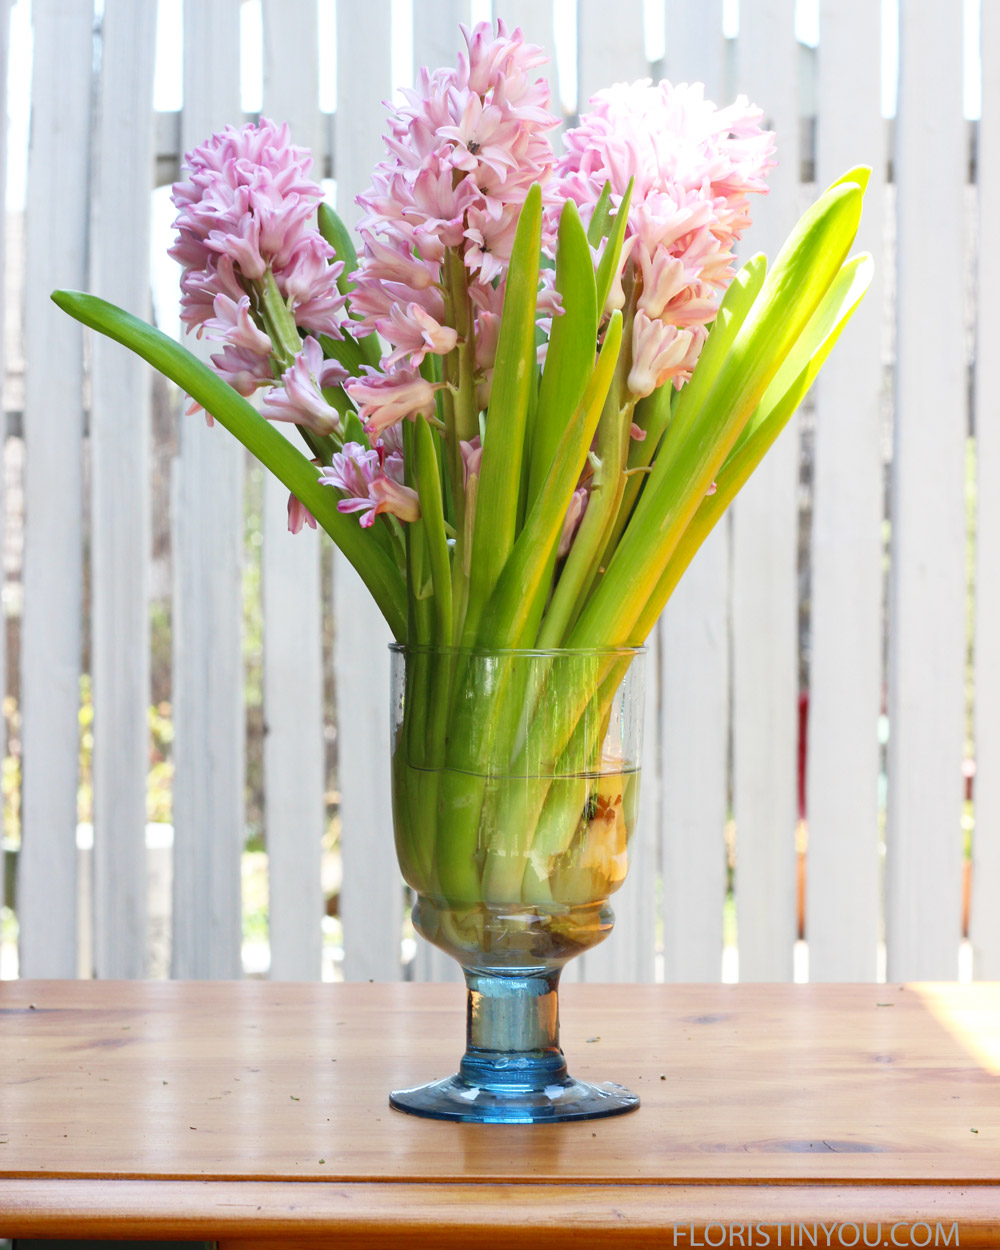 Take a few individual flowers off Hyacinth.